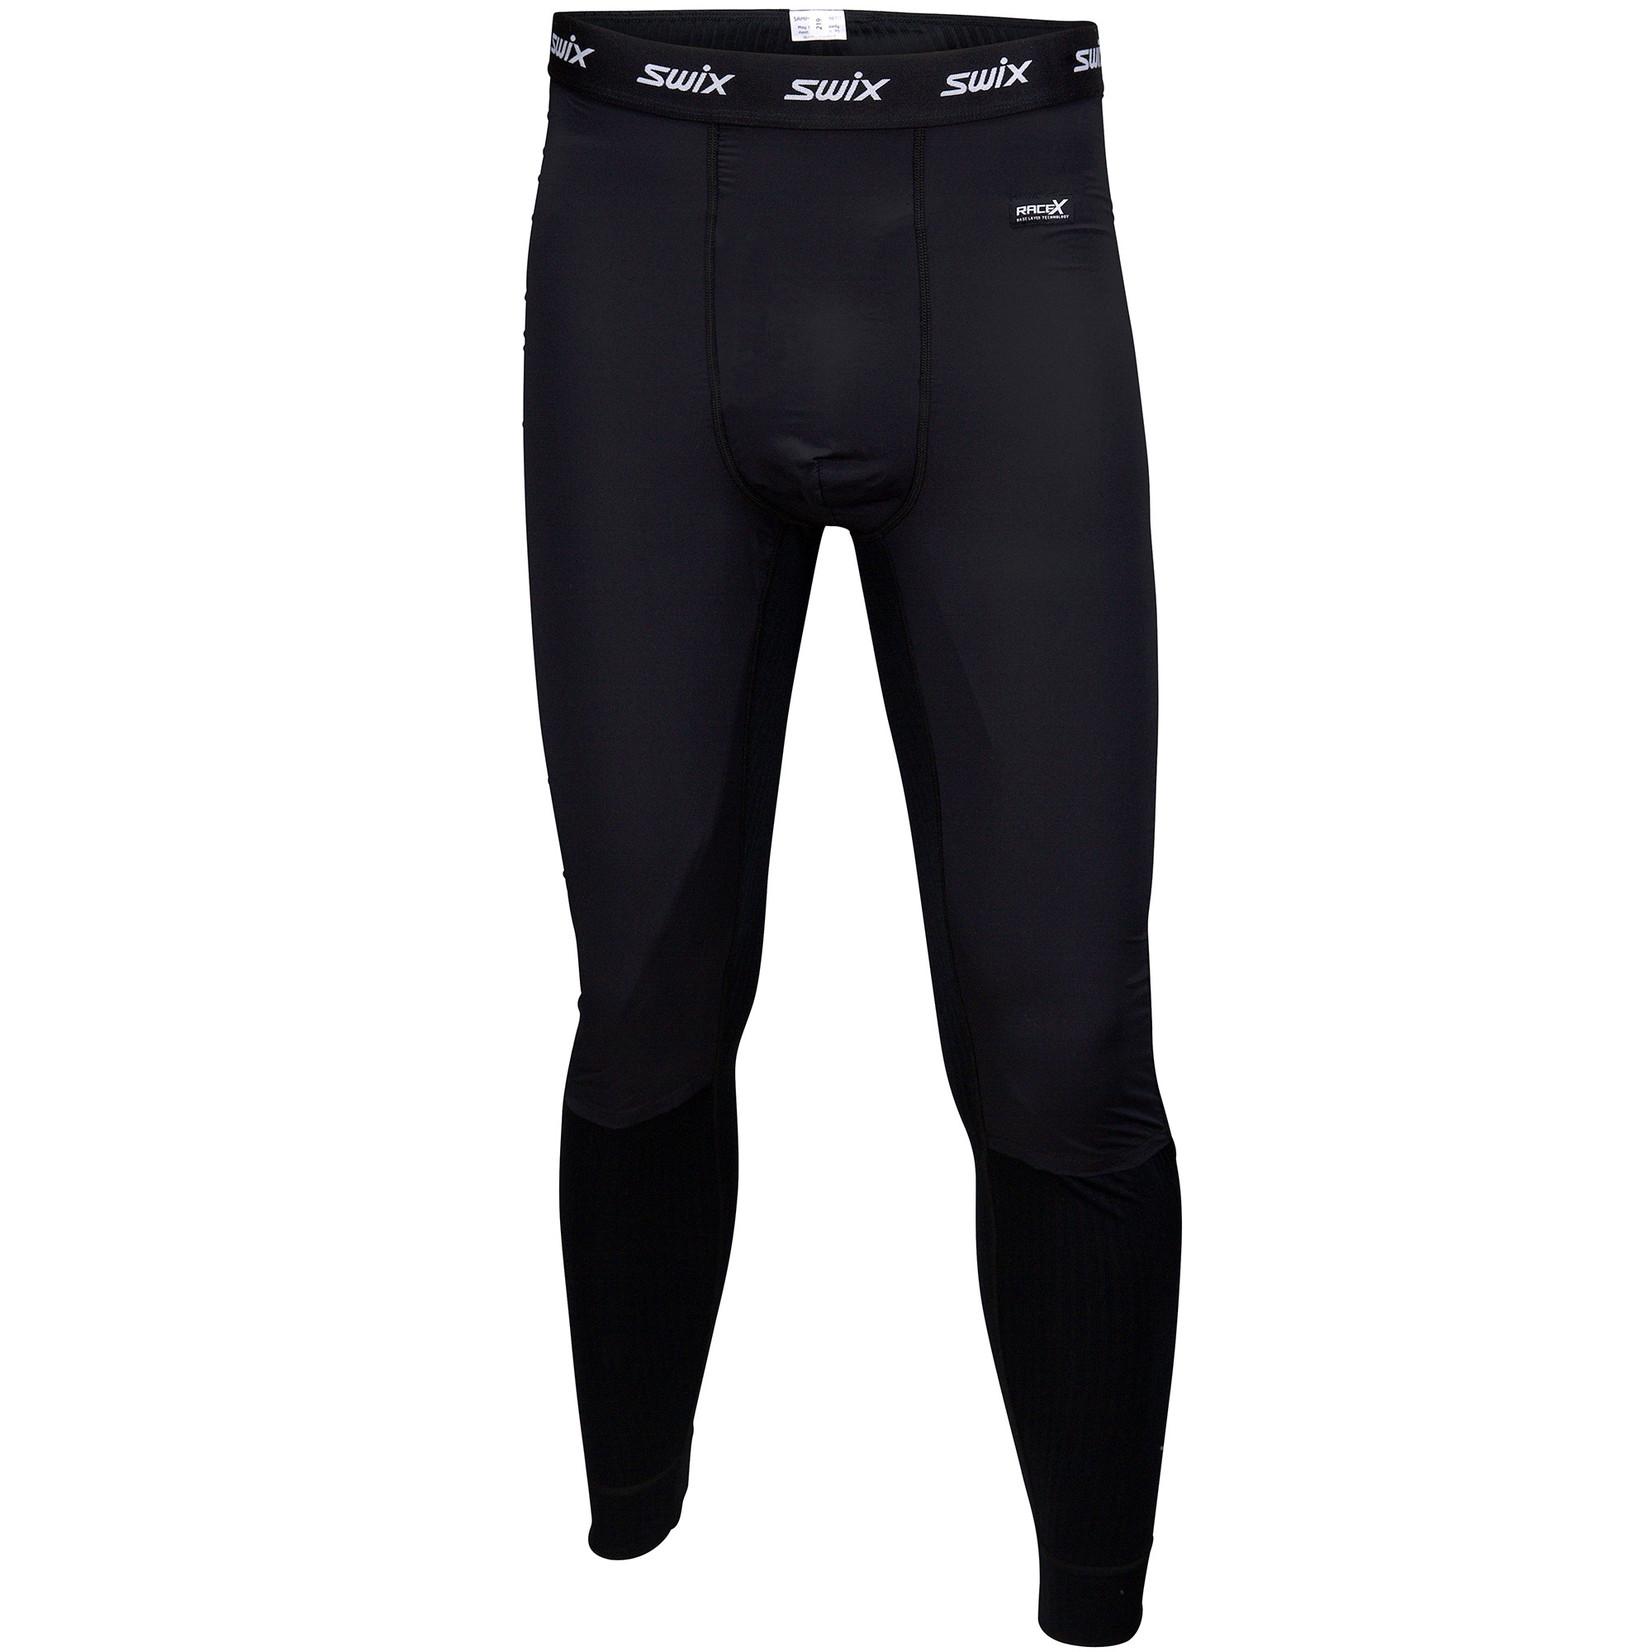 Swix Swix RaceX Bodywear Pants Men's